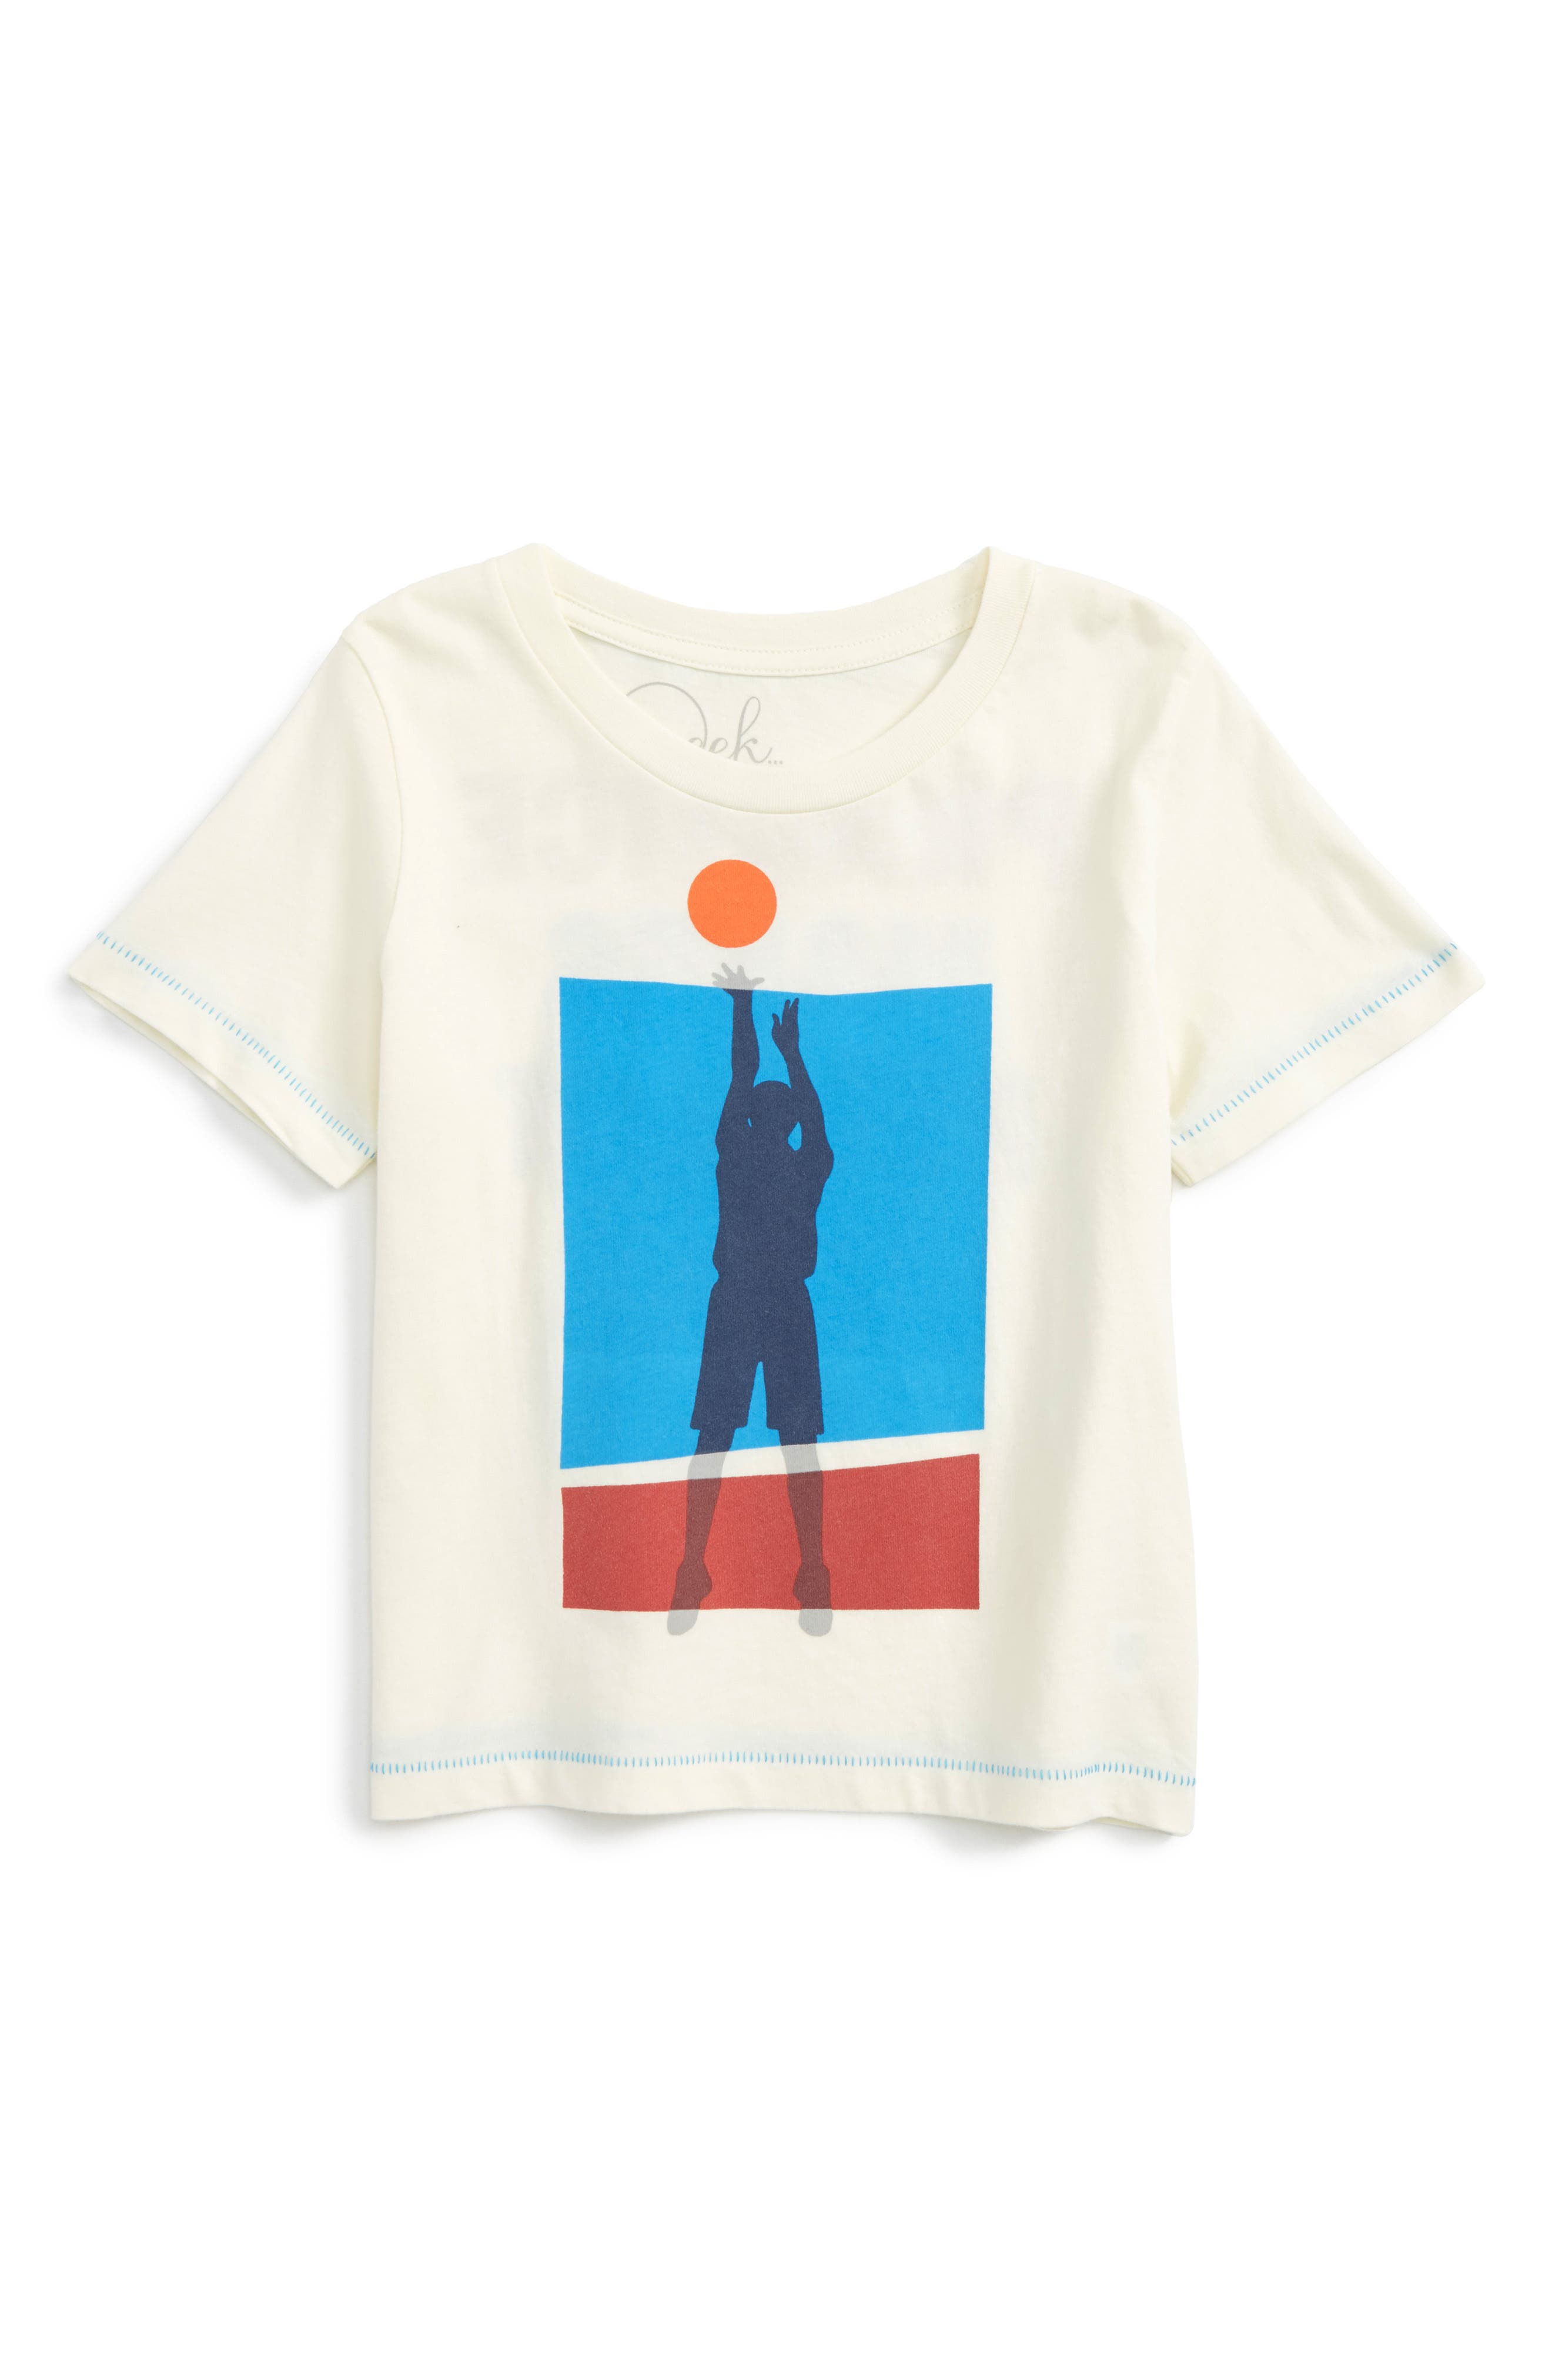 Peek Basketball Practice T-Shirt (Toddler Boys, Little Boys & Big Boys)